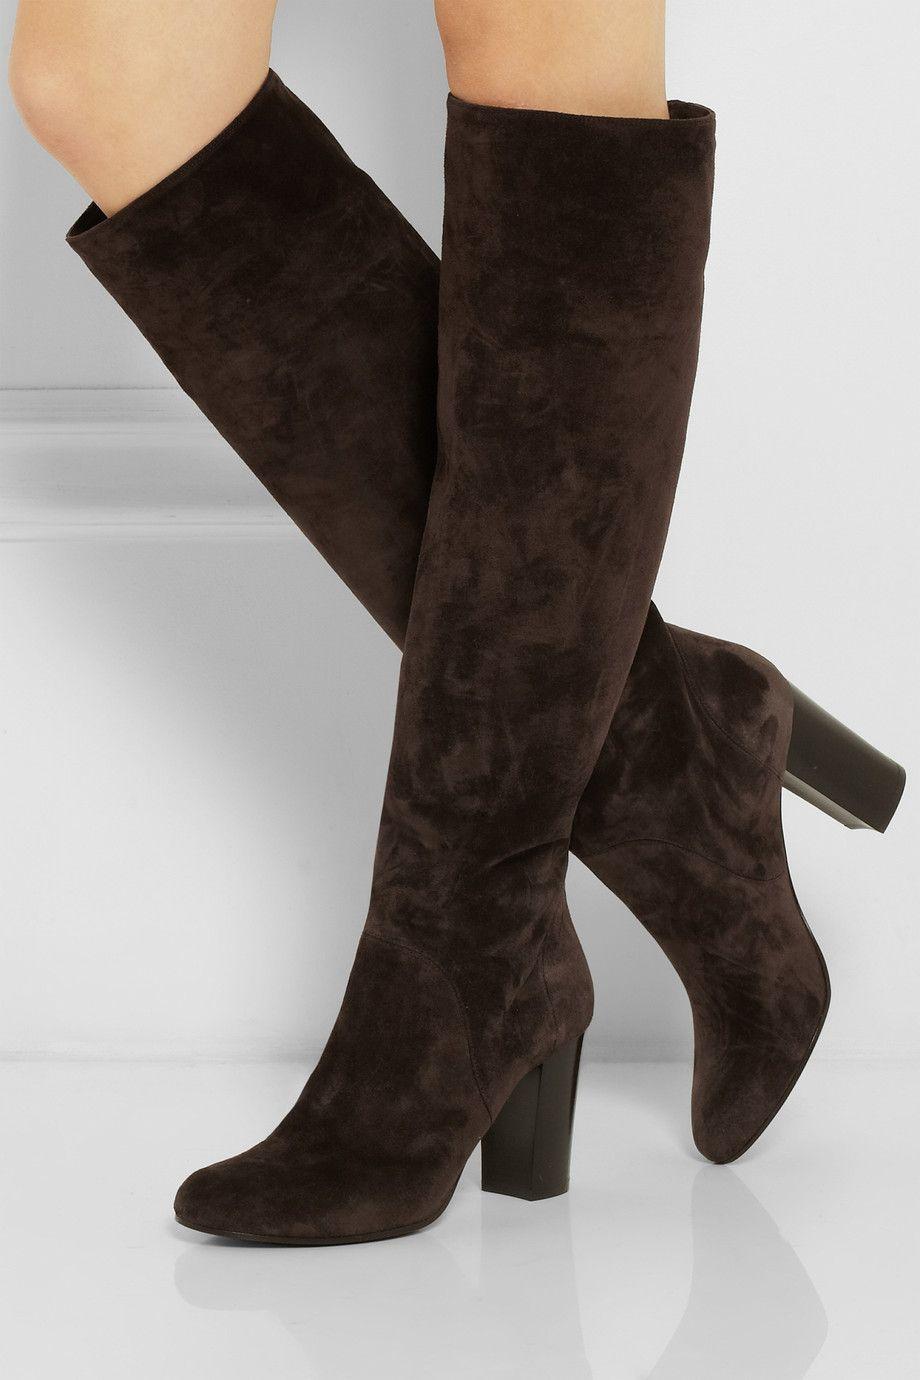 Lanvin Platform Knee-High Boots discount how much eT2zeB